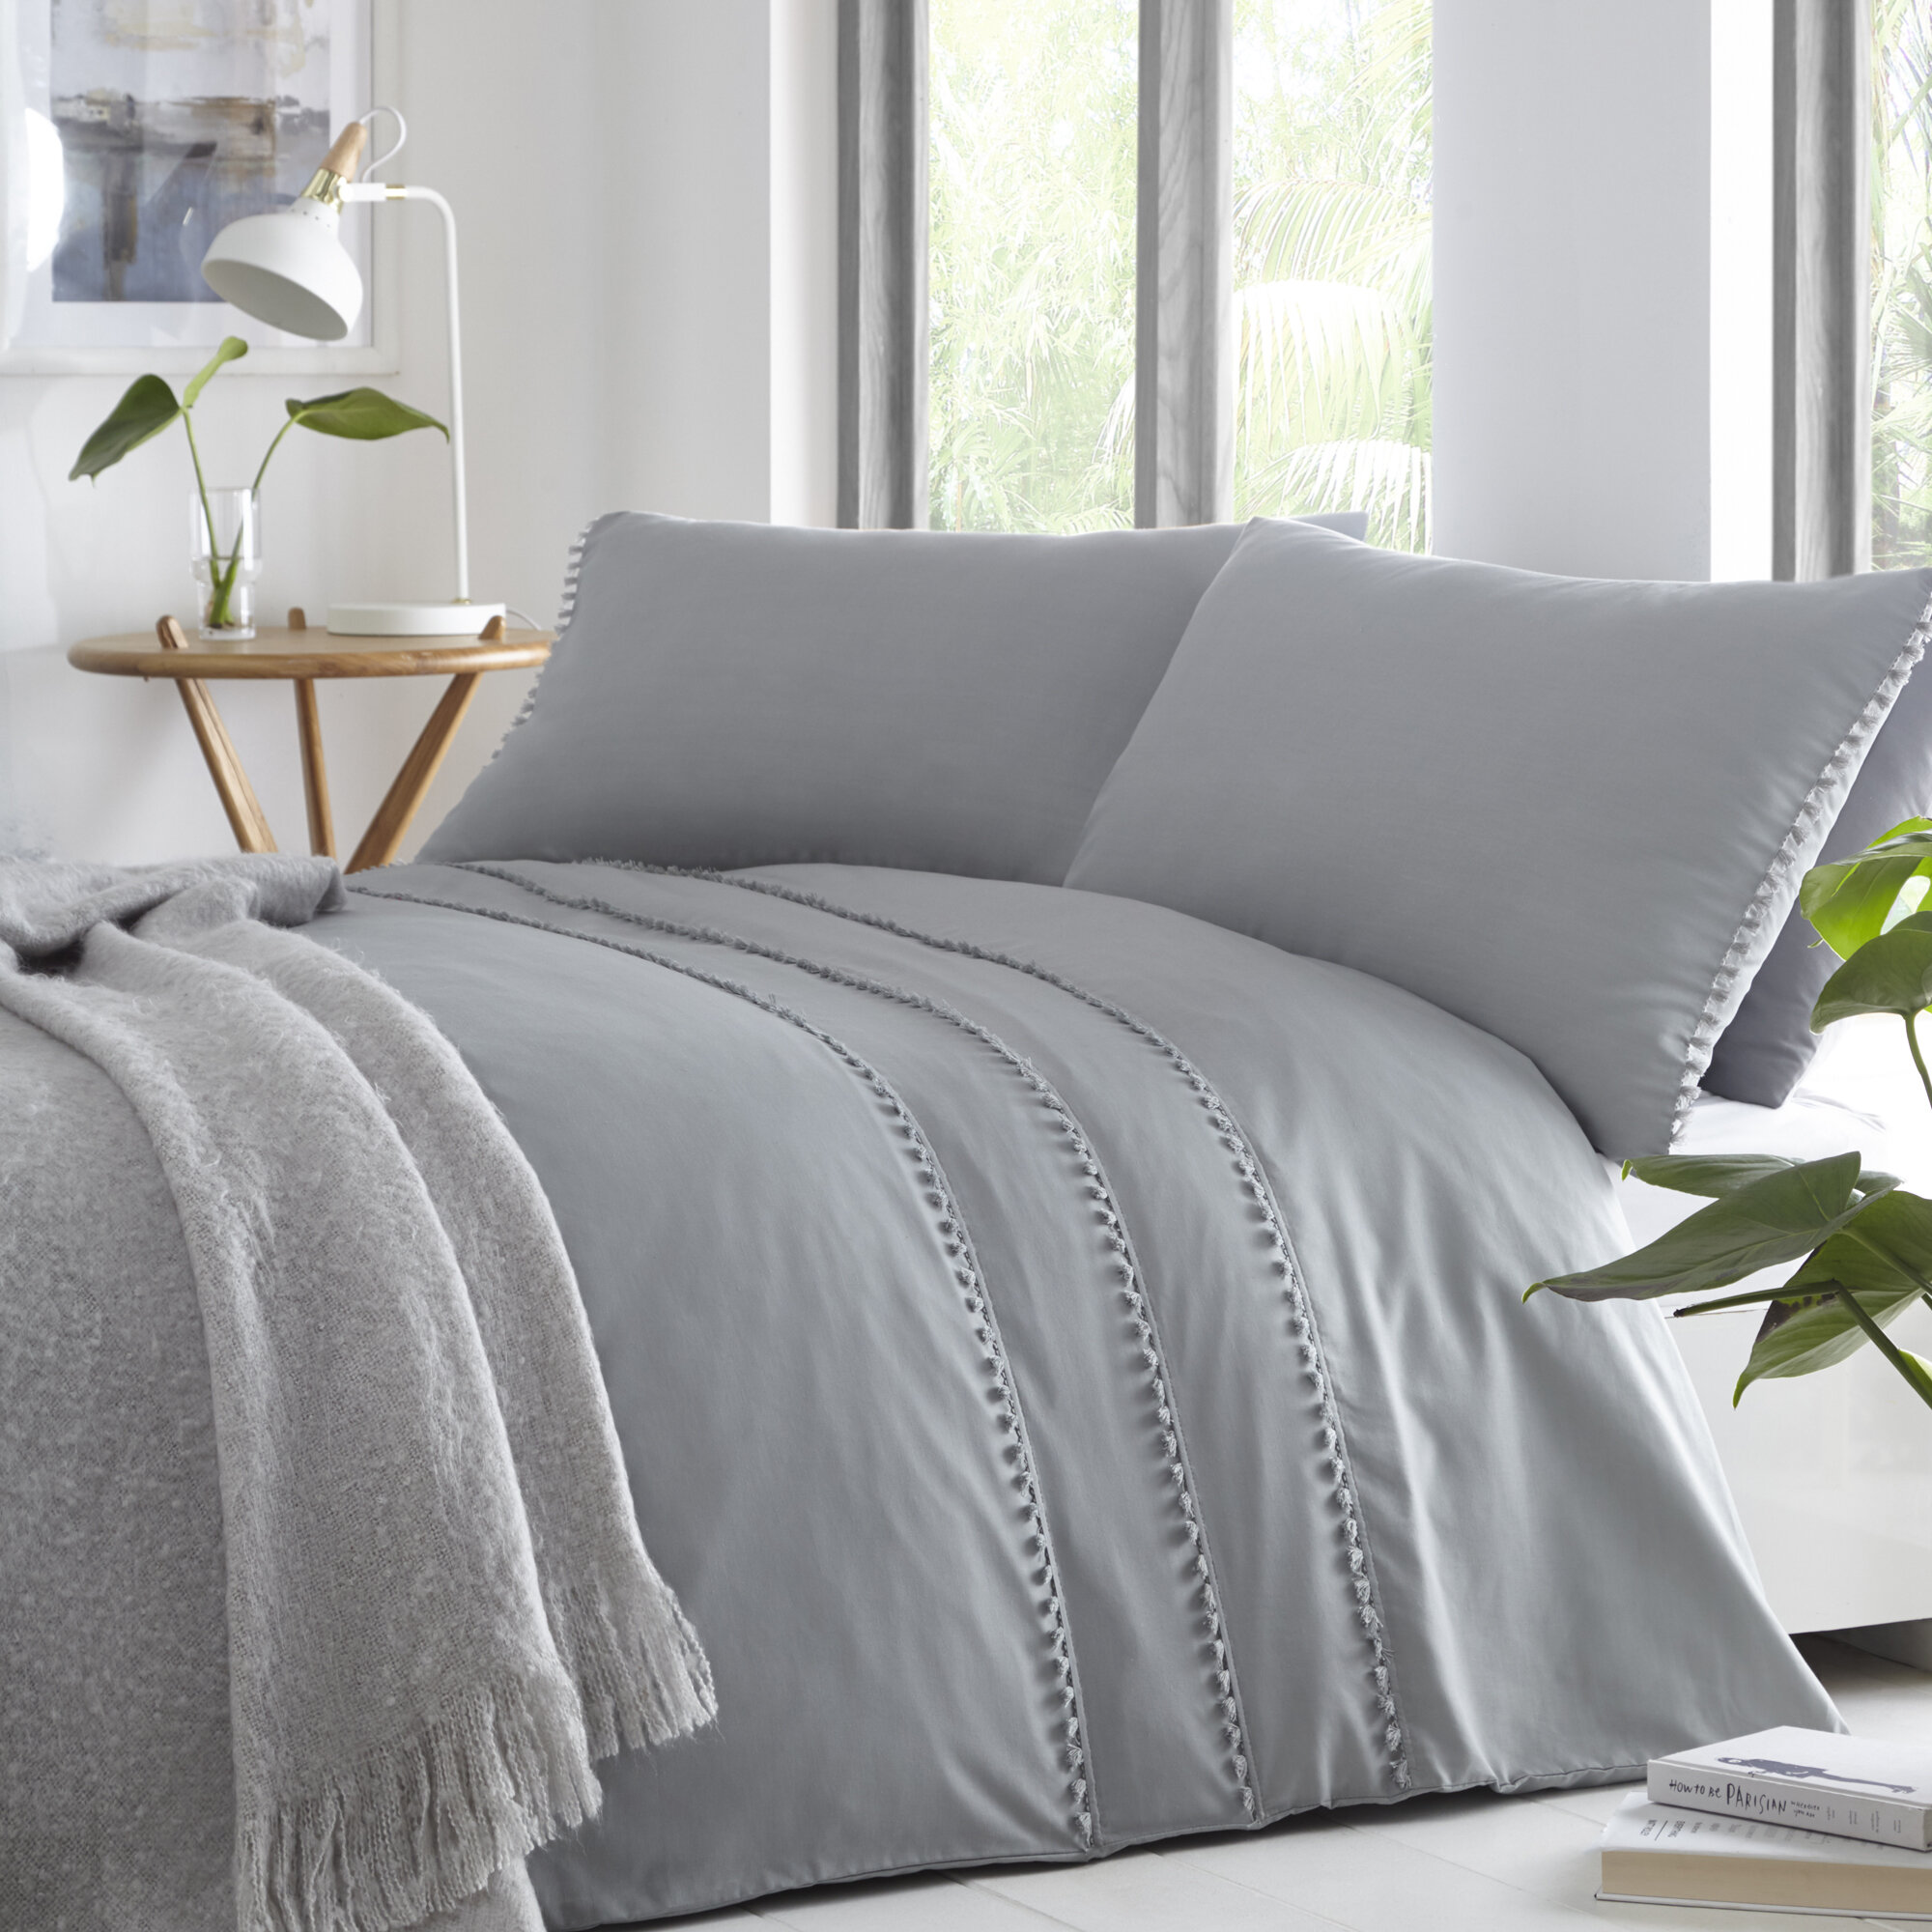 Duvet Covers Duvet Sets Bedding Sets Wayfair Co Uk